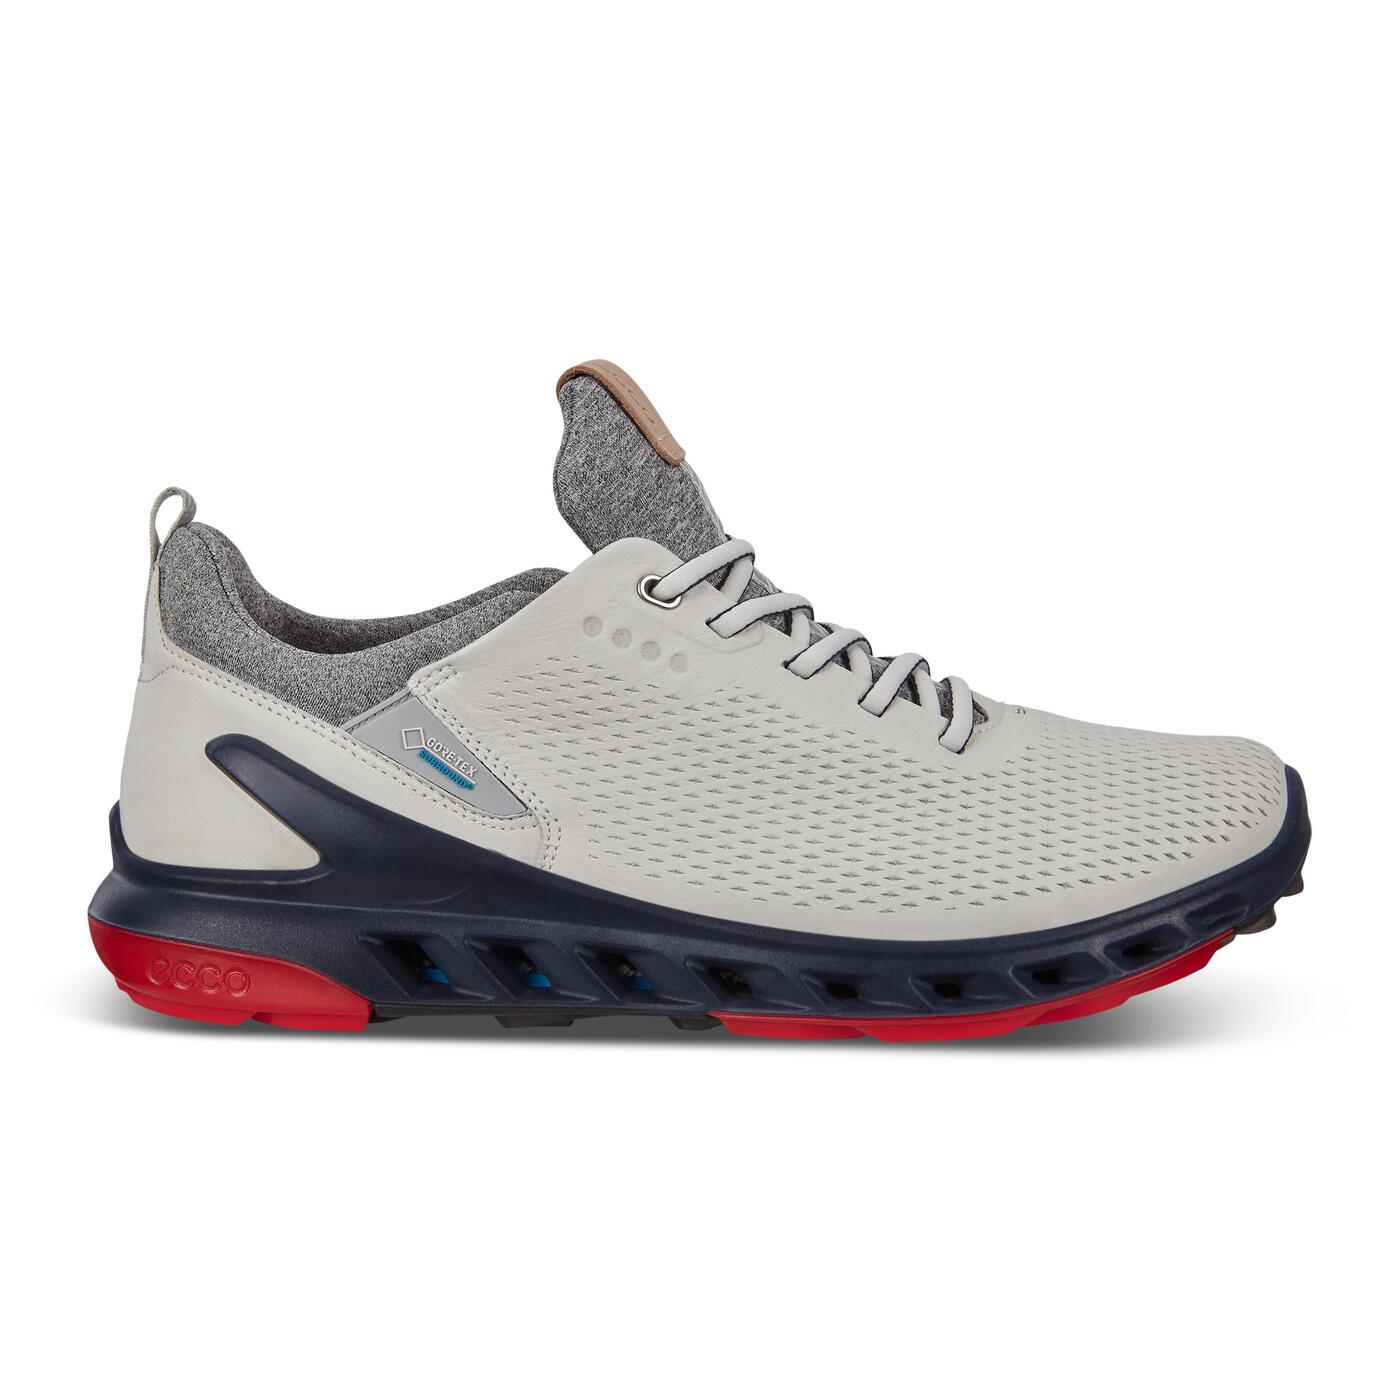 Ecco Men S Golf Biom Cool Pro Shoe Men S Hybrid Golf Shoes Ecco Shoes